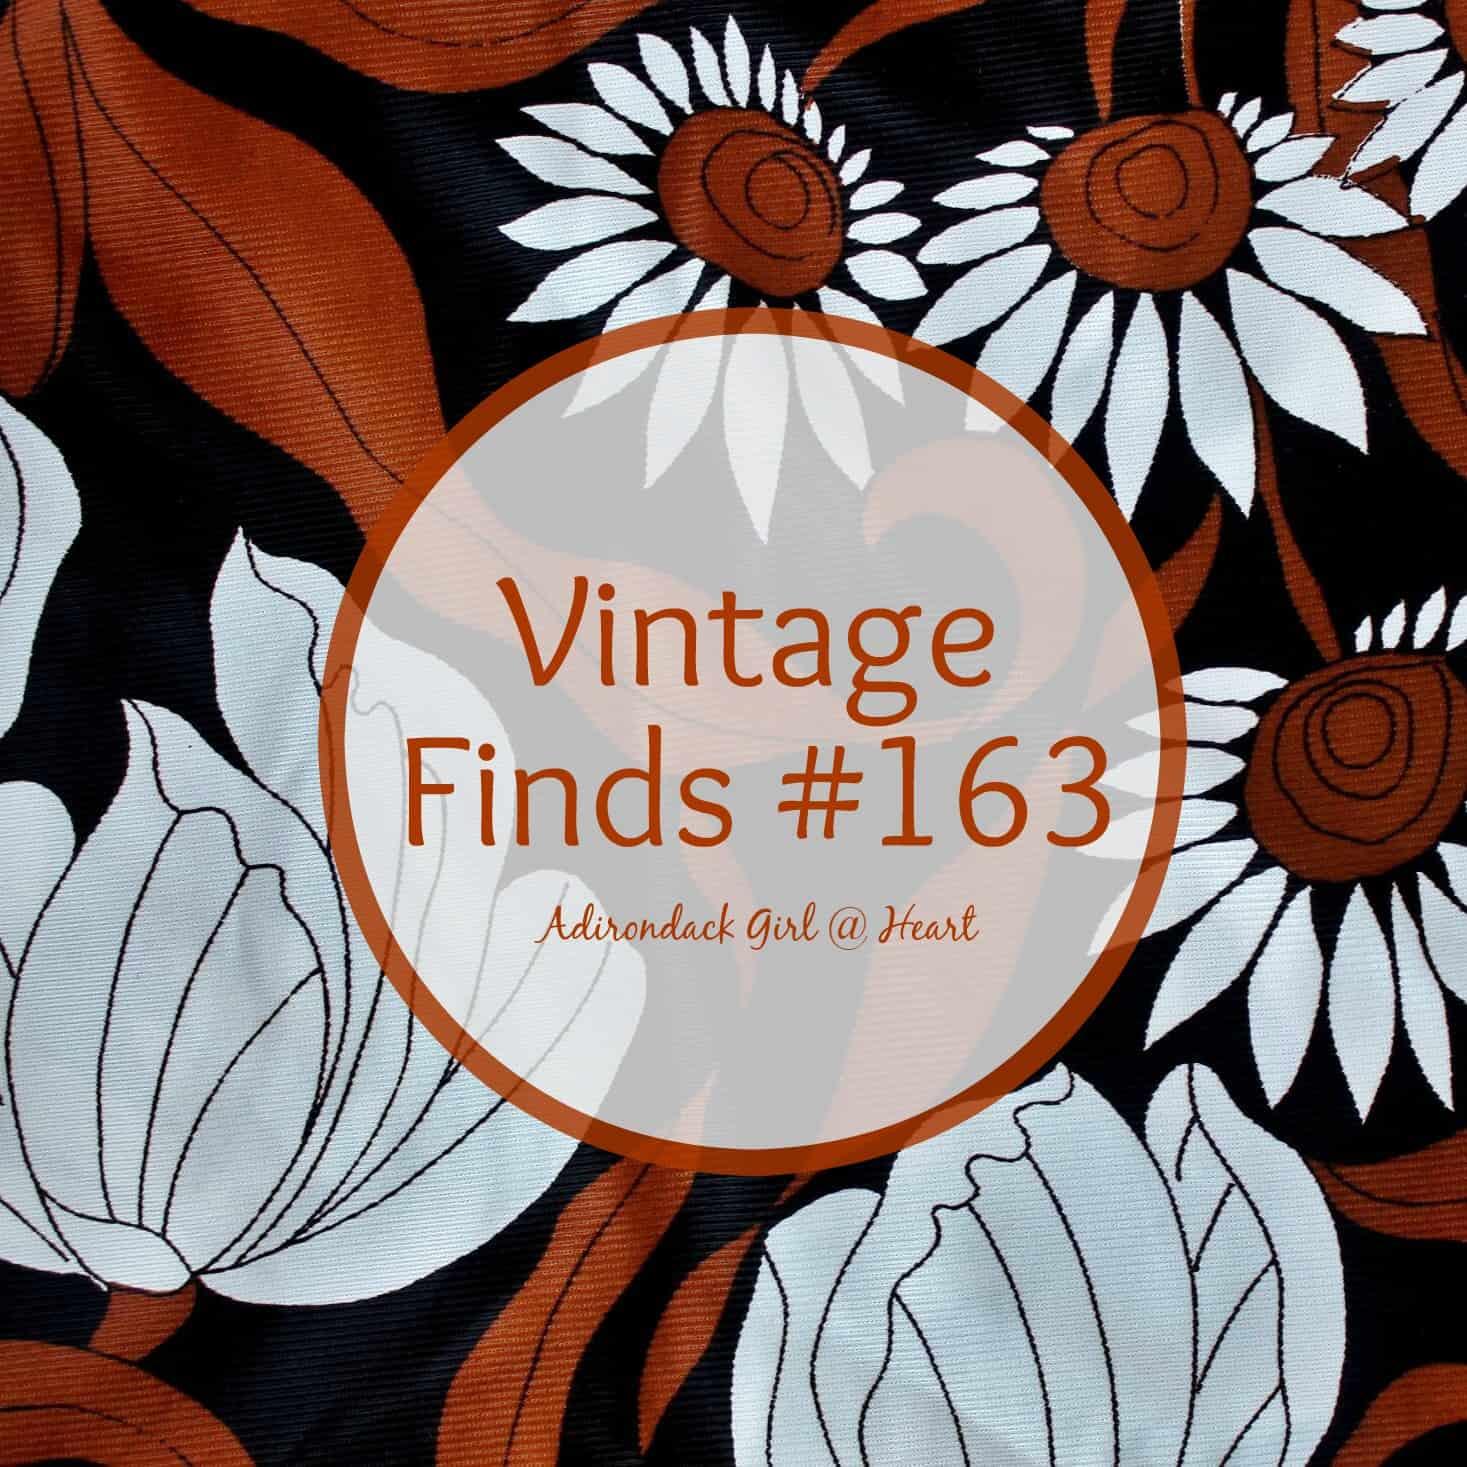 Vintage finds #162 at adirondackgirlatheart.com